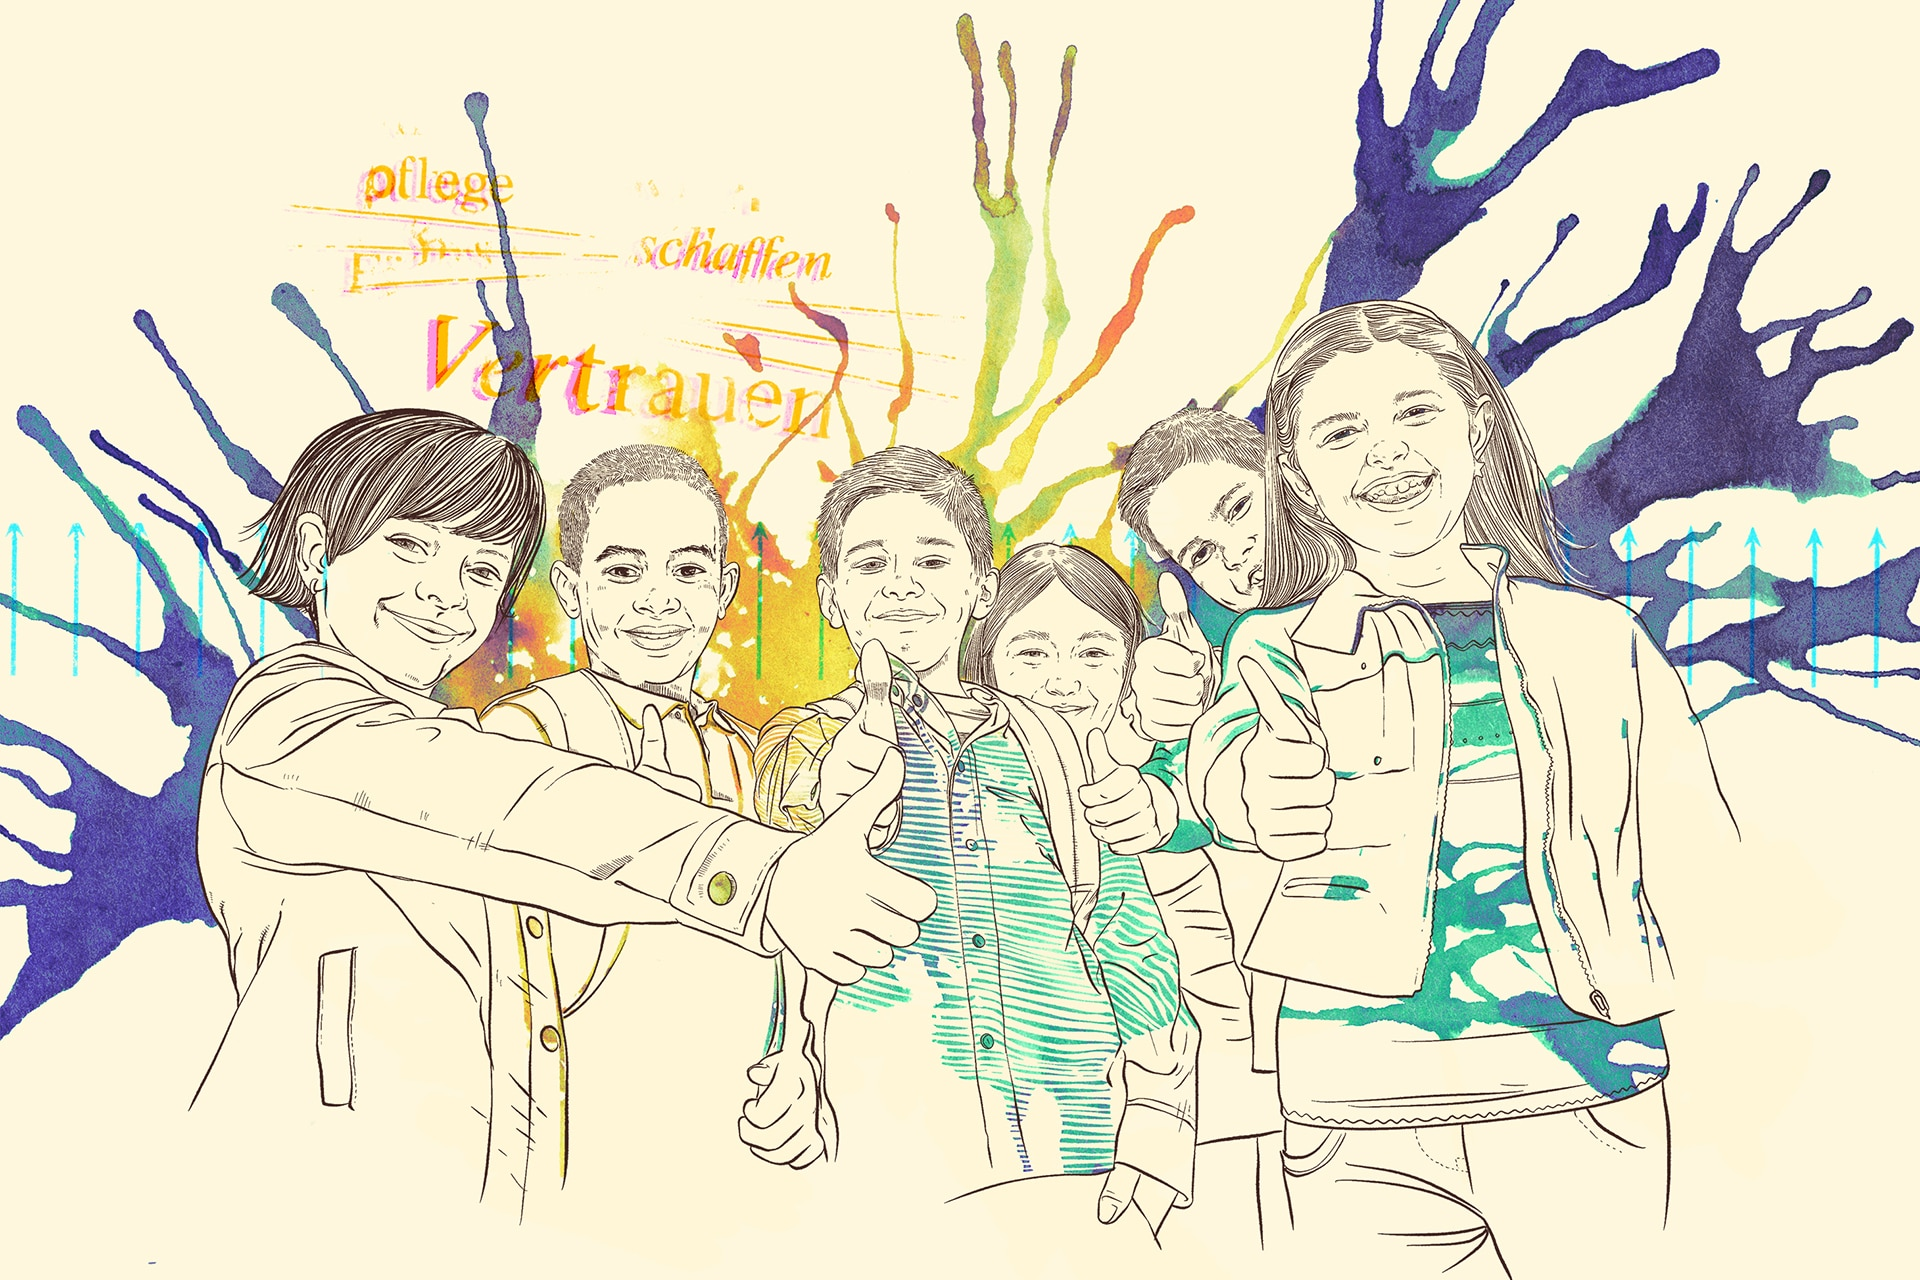 Illustration Pflegekinder